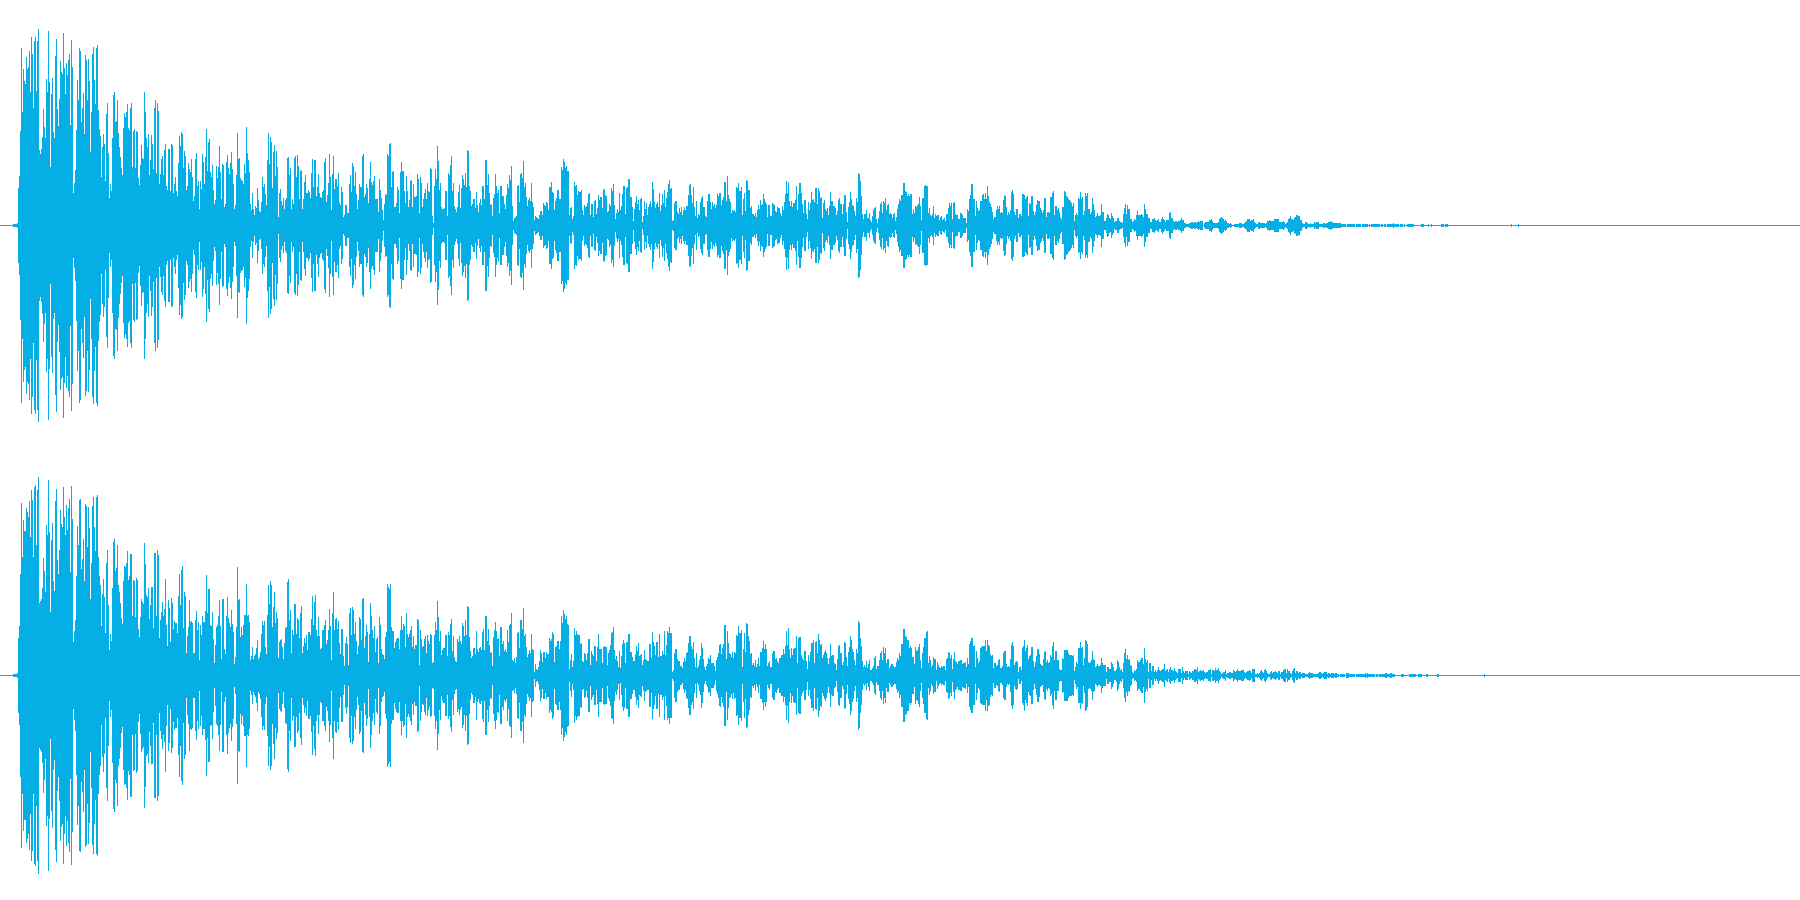 SFバズーカ砲の効果音、バズーカ砲、キ…の再生済みの波形